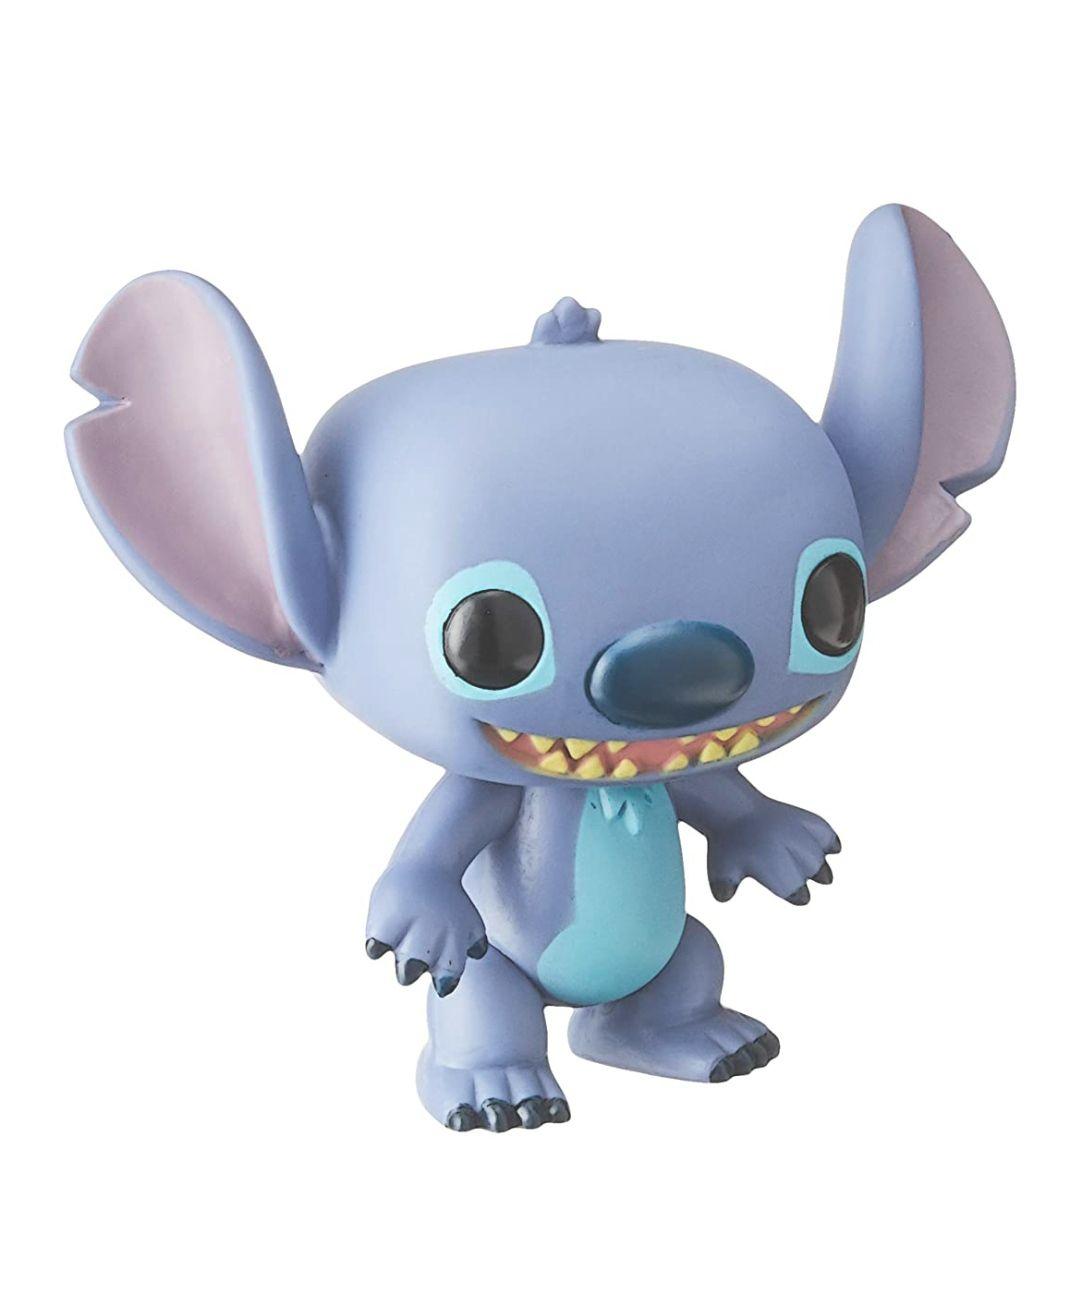 Amazon: Stitch funko